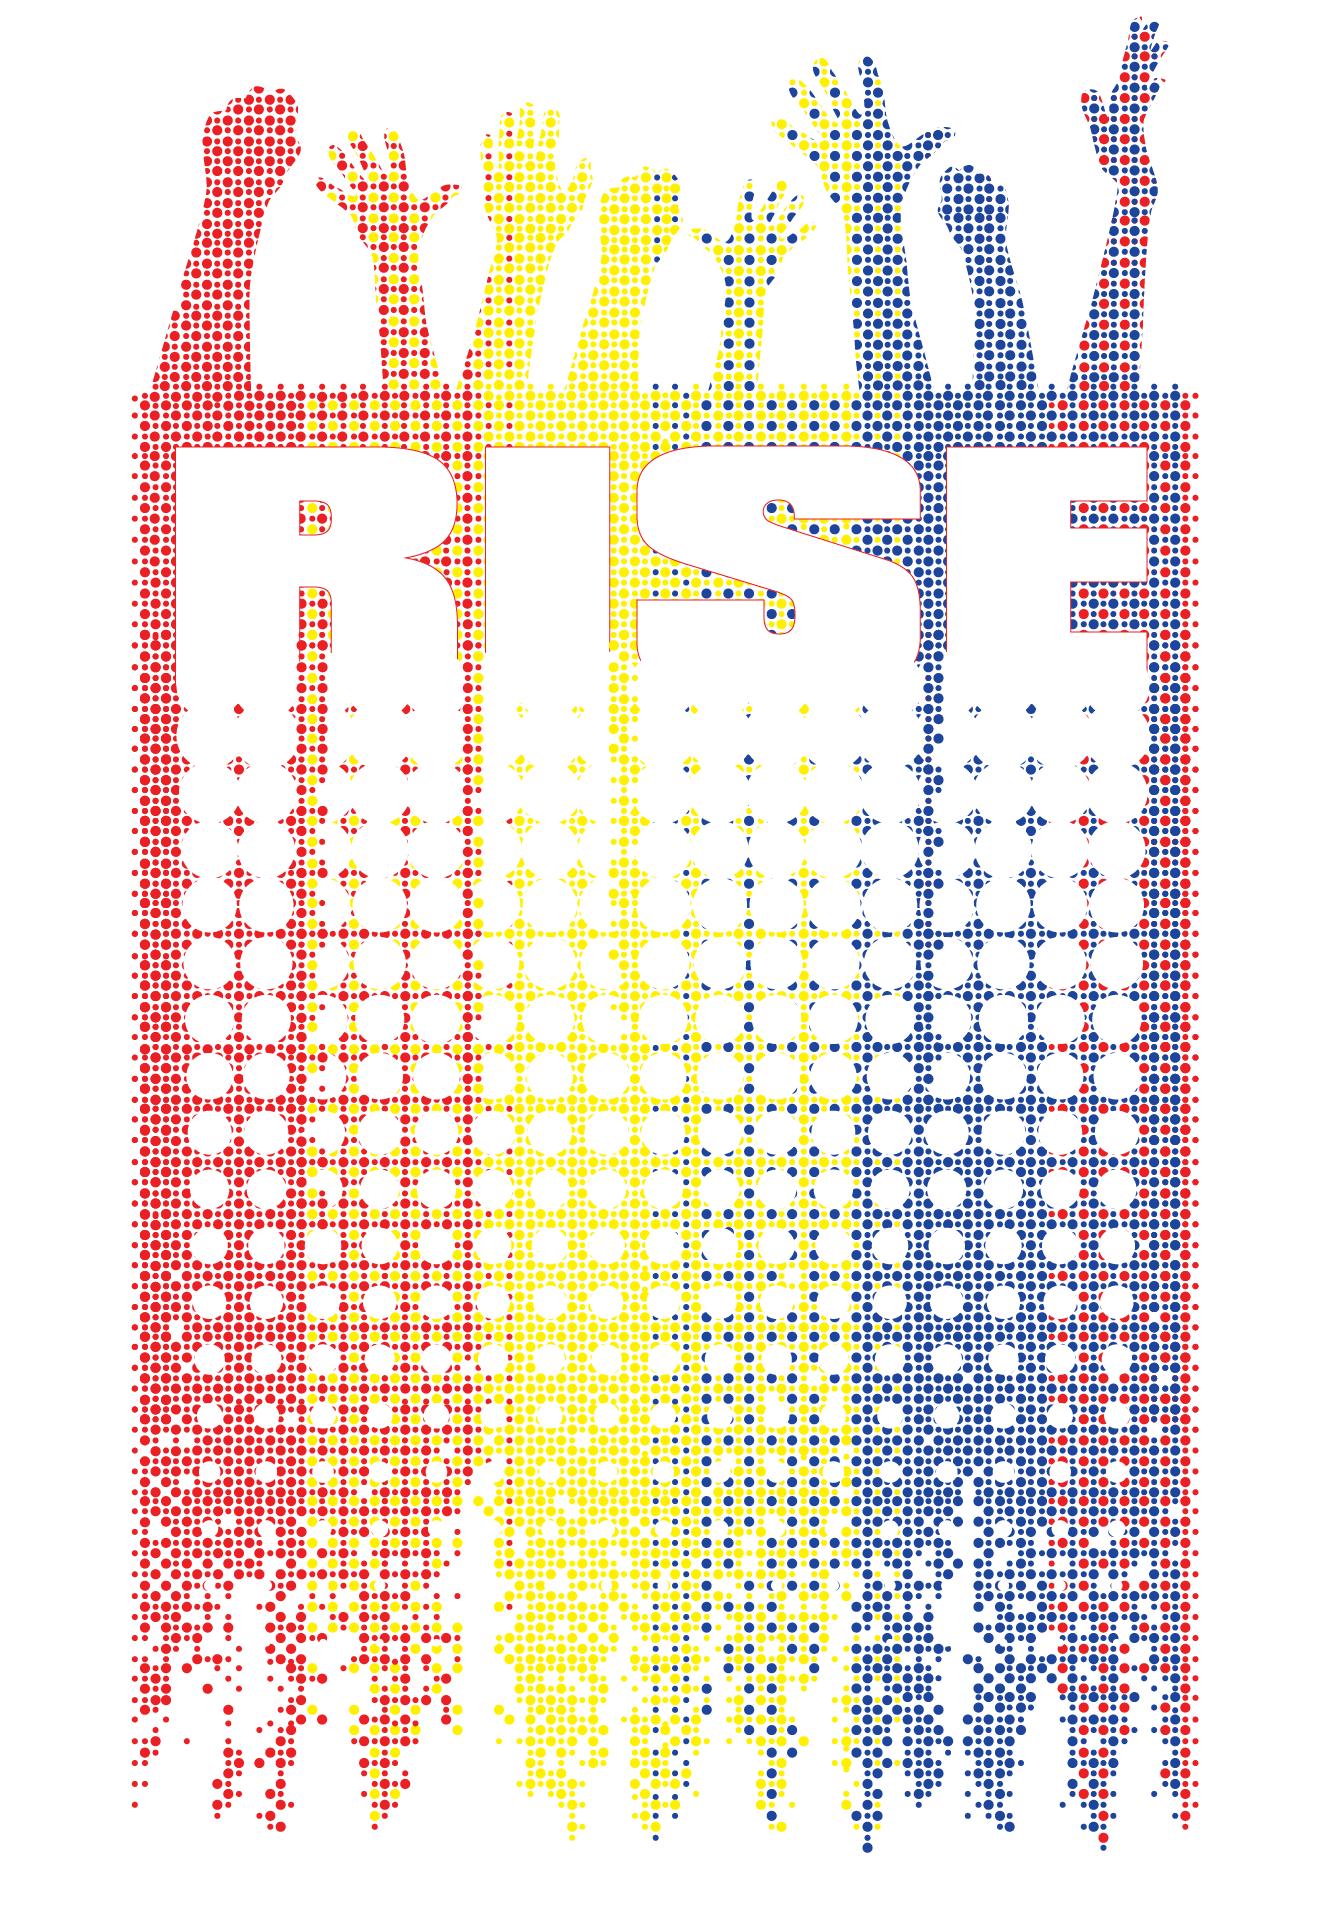 3 color print shirt design